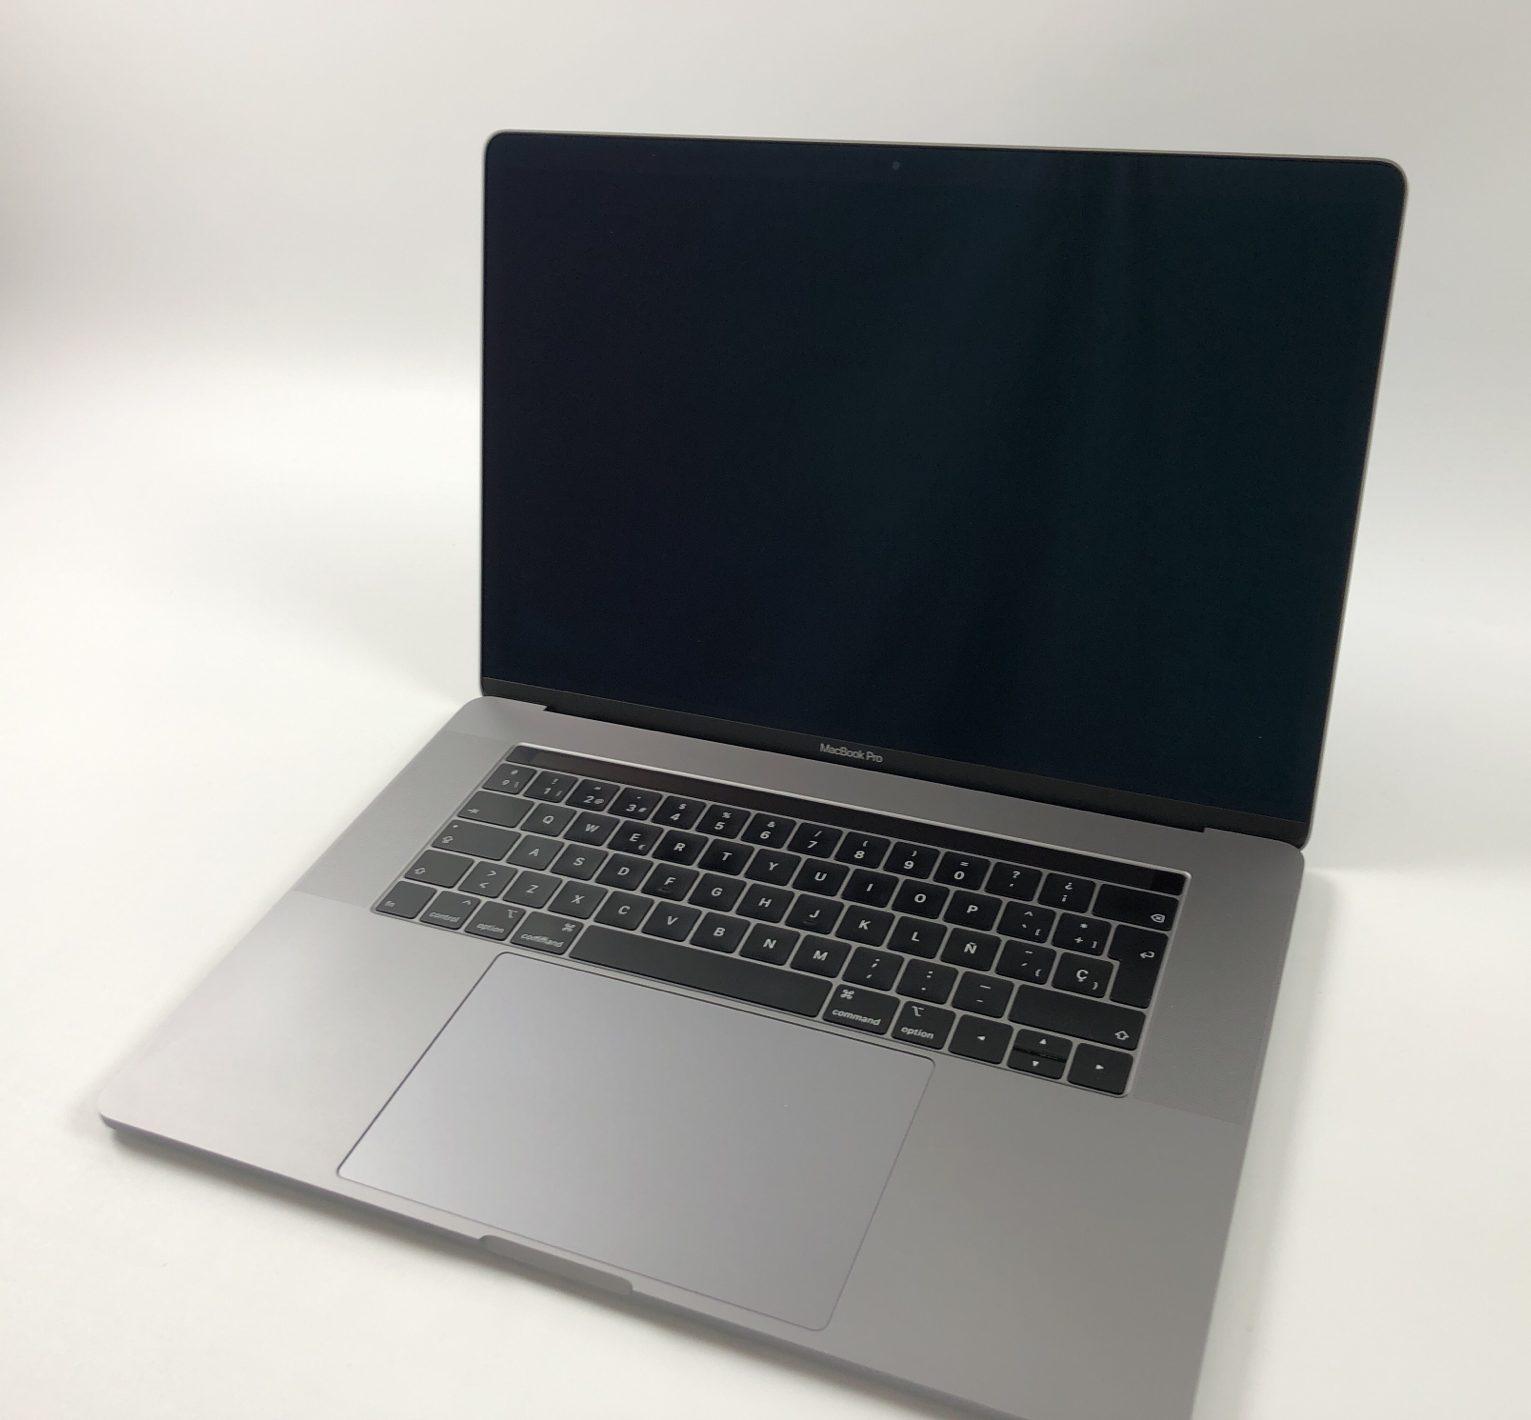 "MacBook Pro 15"" Touch Bar Mid 2018 (Intel 6-Core i9 2.9 GHz 32 GB RAM 2 TB SSD), Space Gray, Intel 6-Core i9 2.9 GHz, 32 GB RAM, 2 TB SSD, imagen 1"